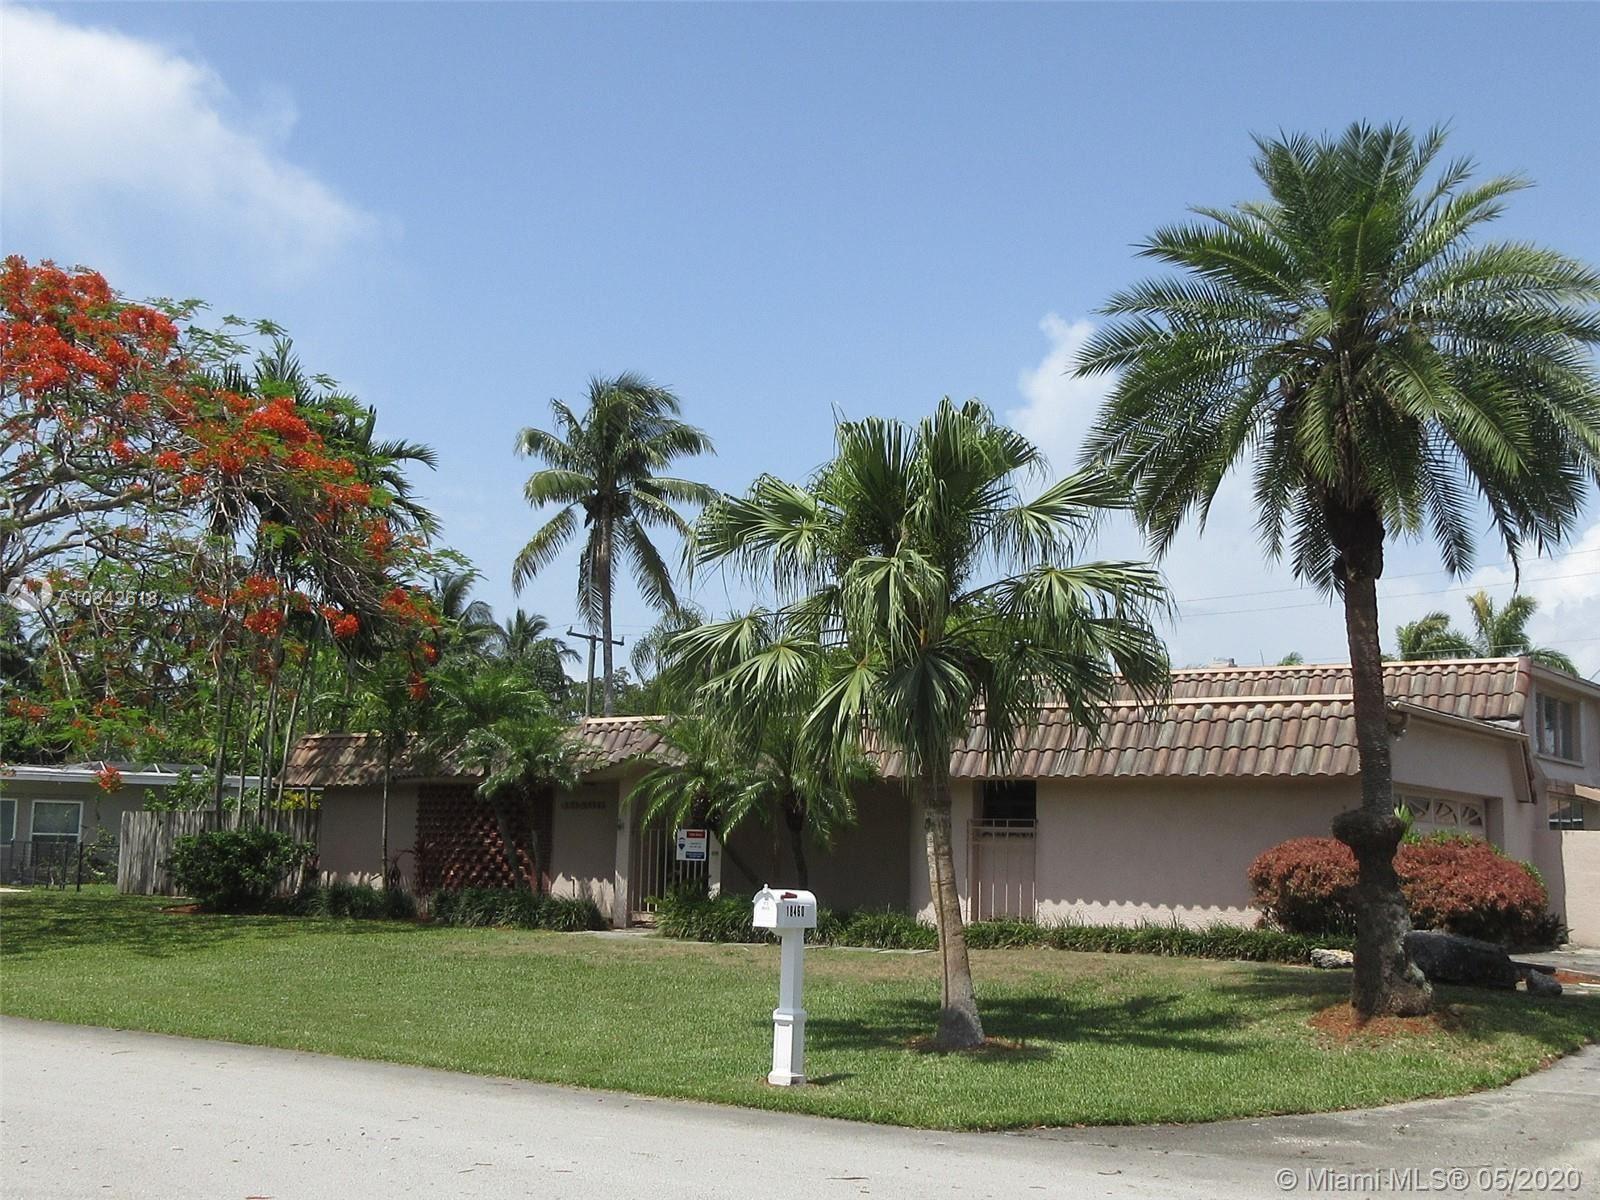 18460 SW 83rd Ct, Cutler Bay, FL 33157 - #: A10842618